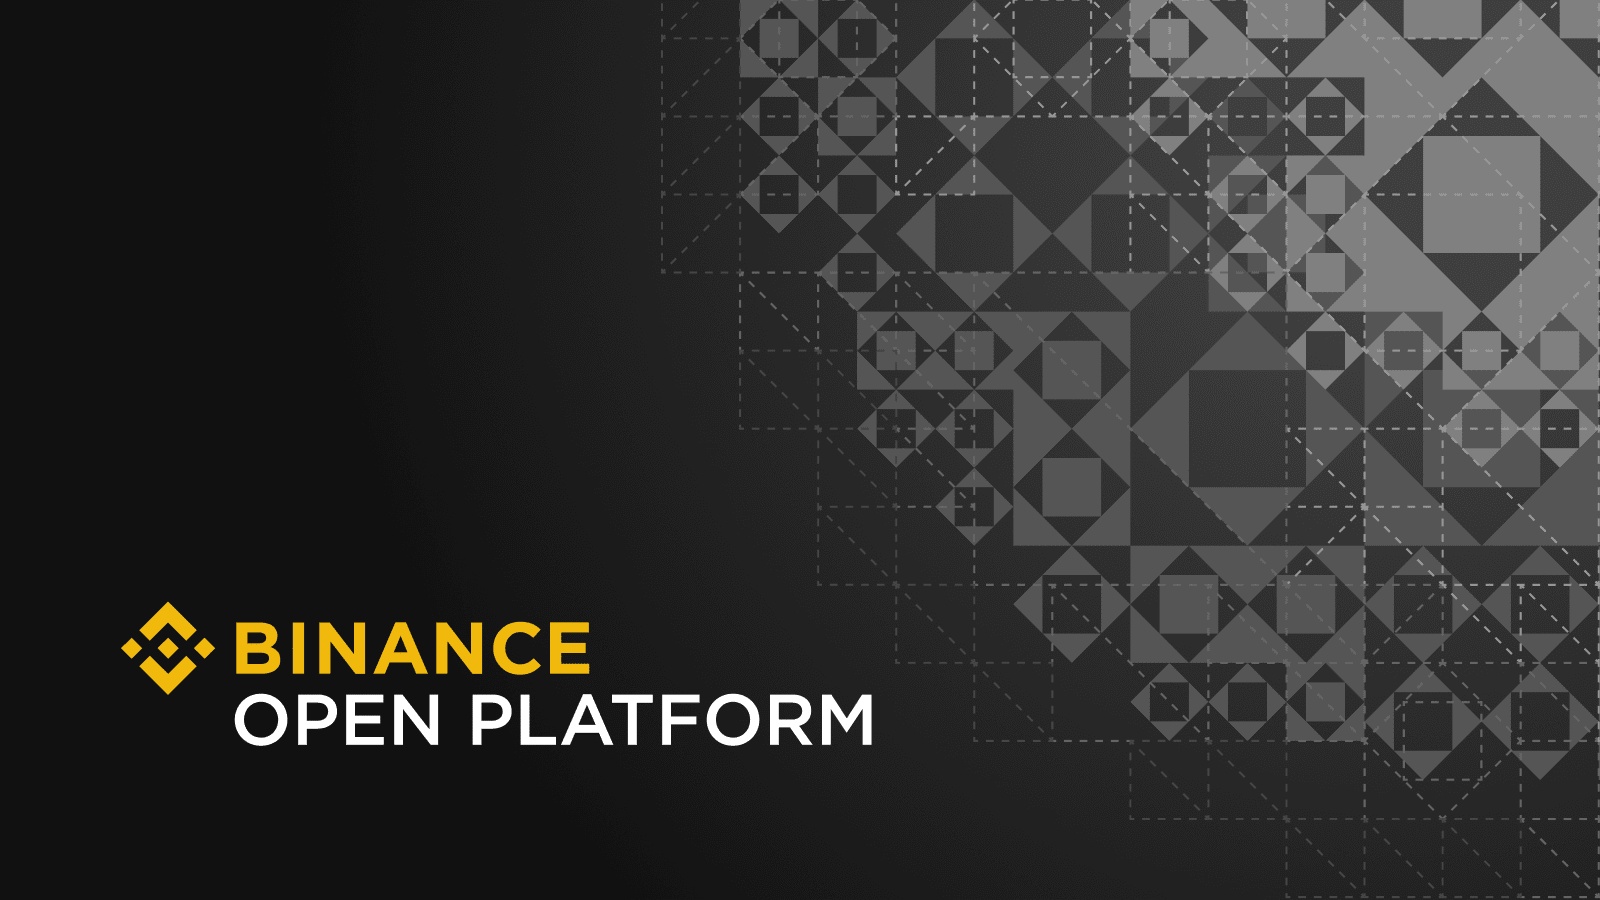 Binance - The Platforms